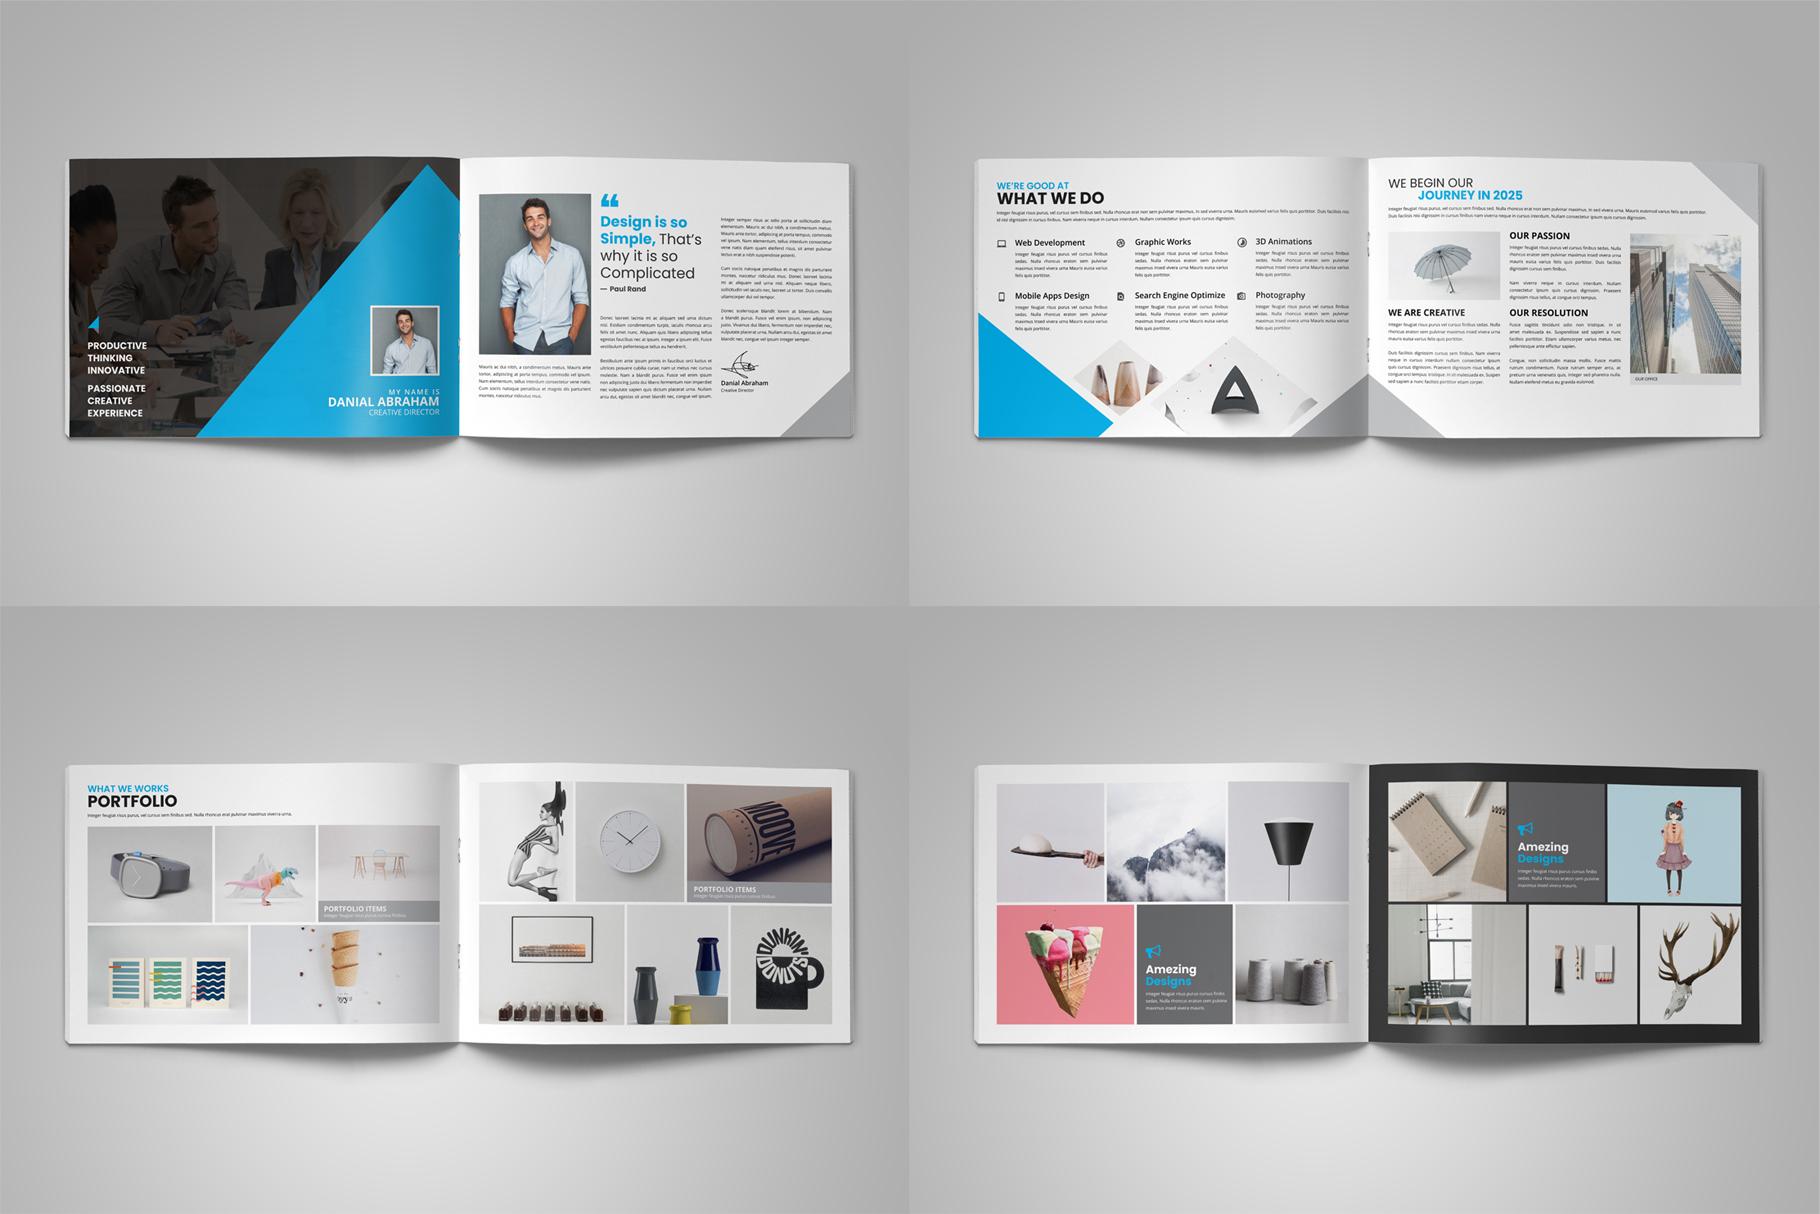 Digital Agency Portfolio Brochure v2 example image 11